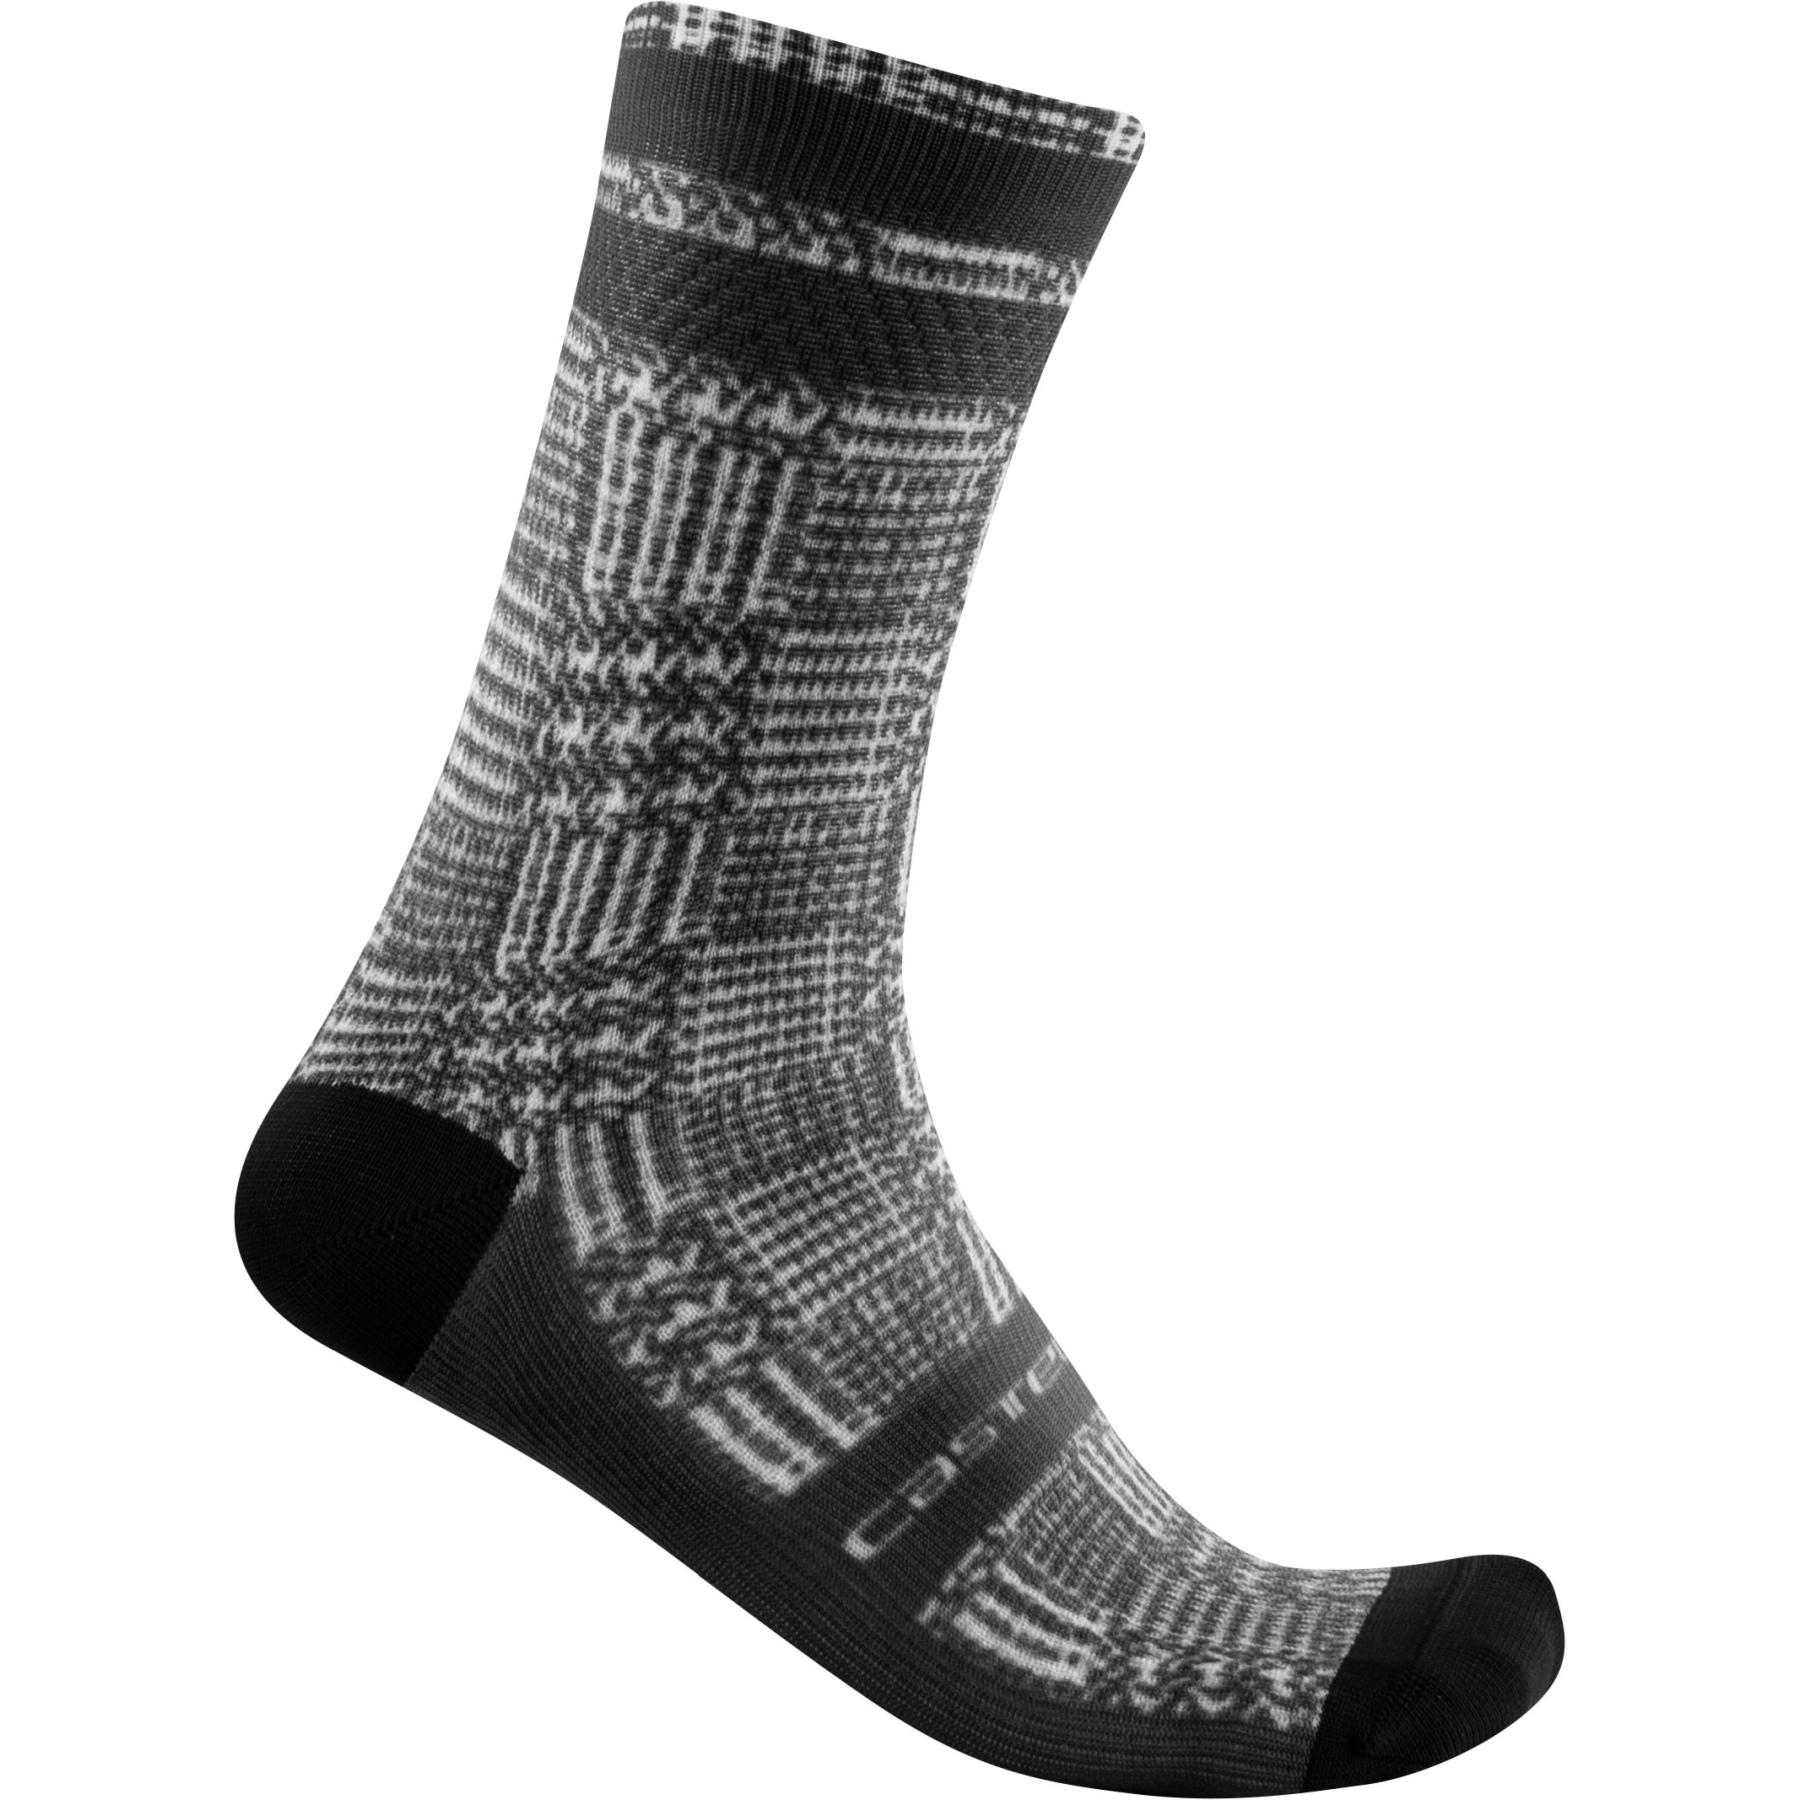 Castelli Maison 18 Socks - black/white 101